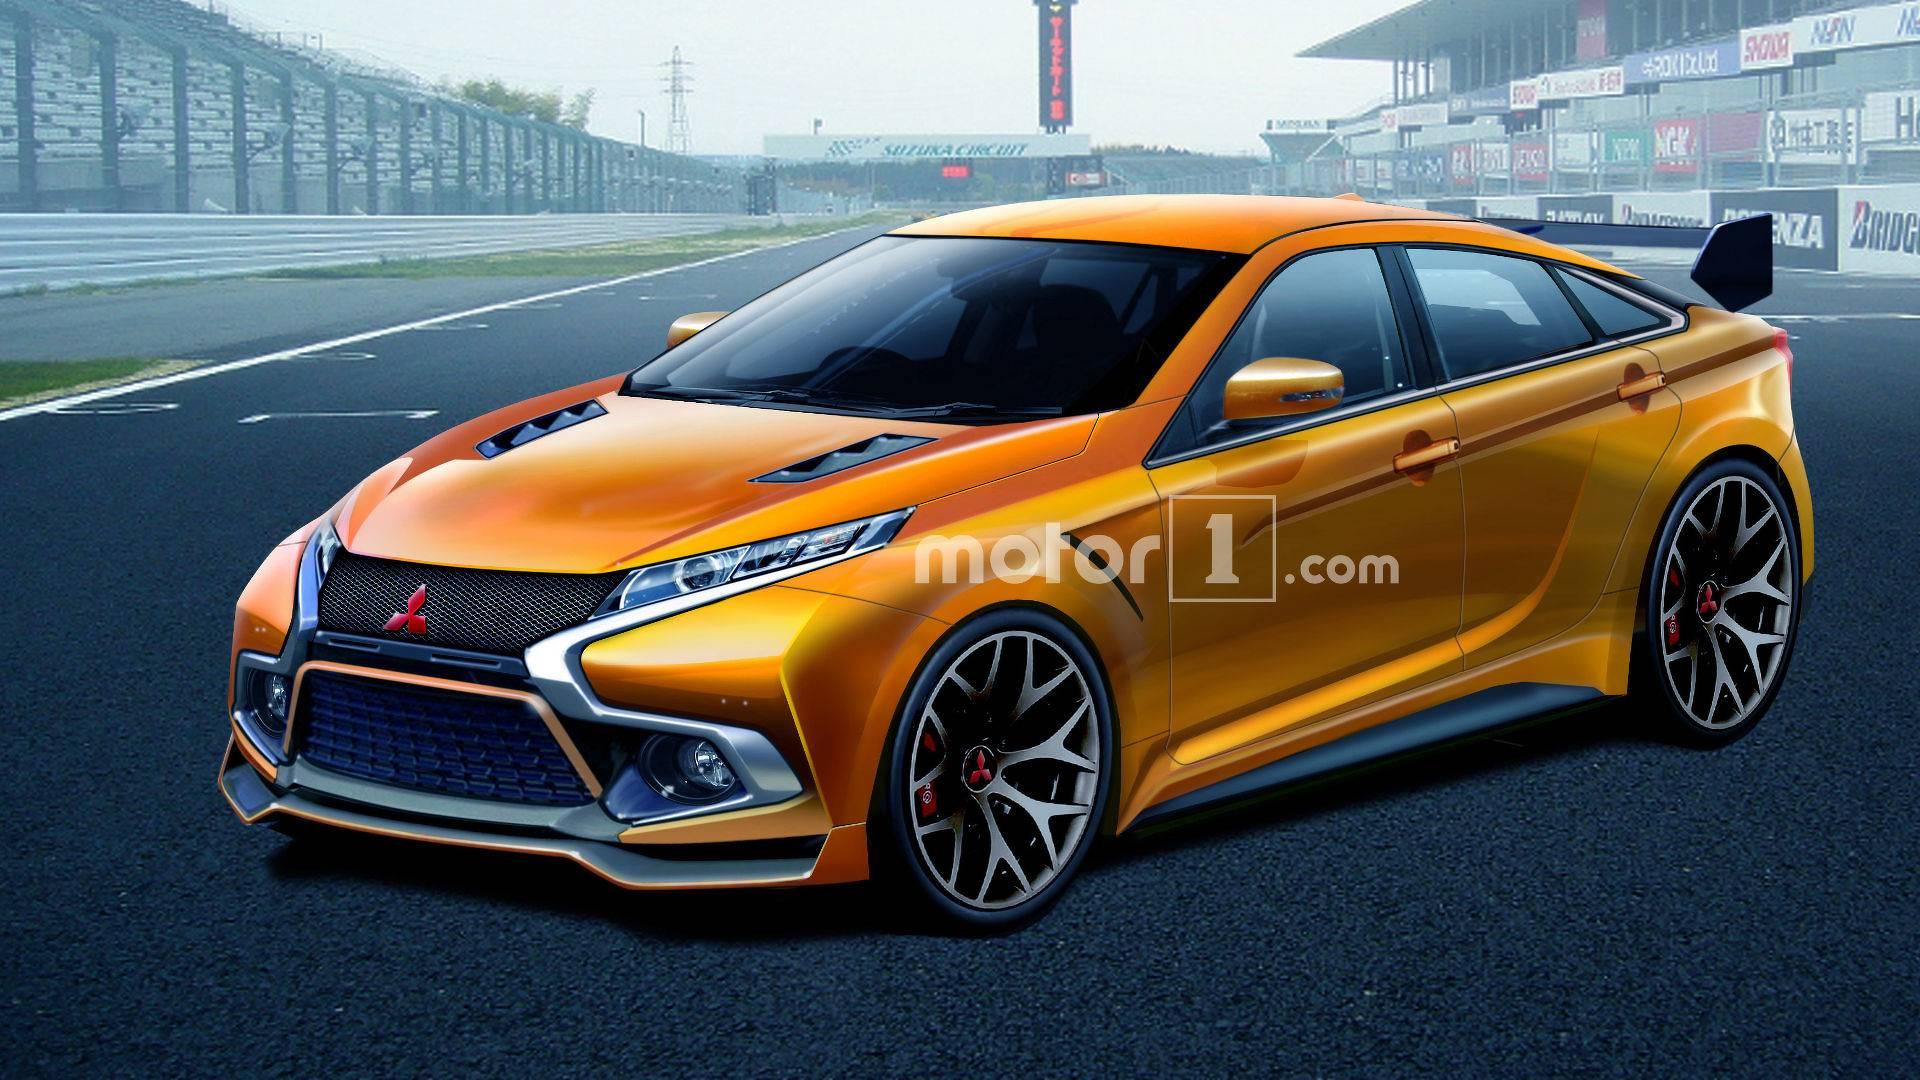 Imagining A Future In Which The Mitsubishi Evo Is Still A